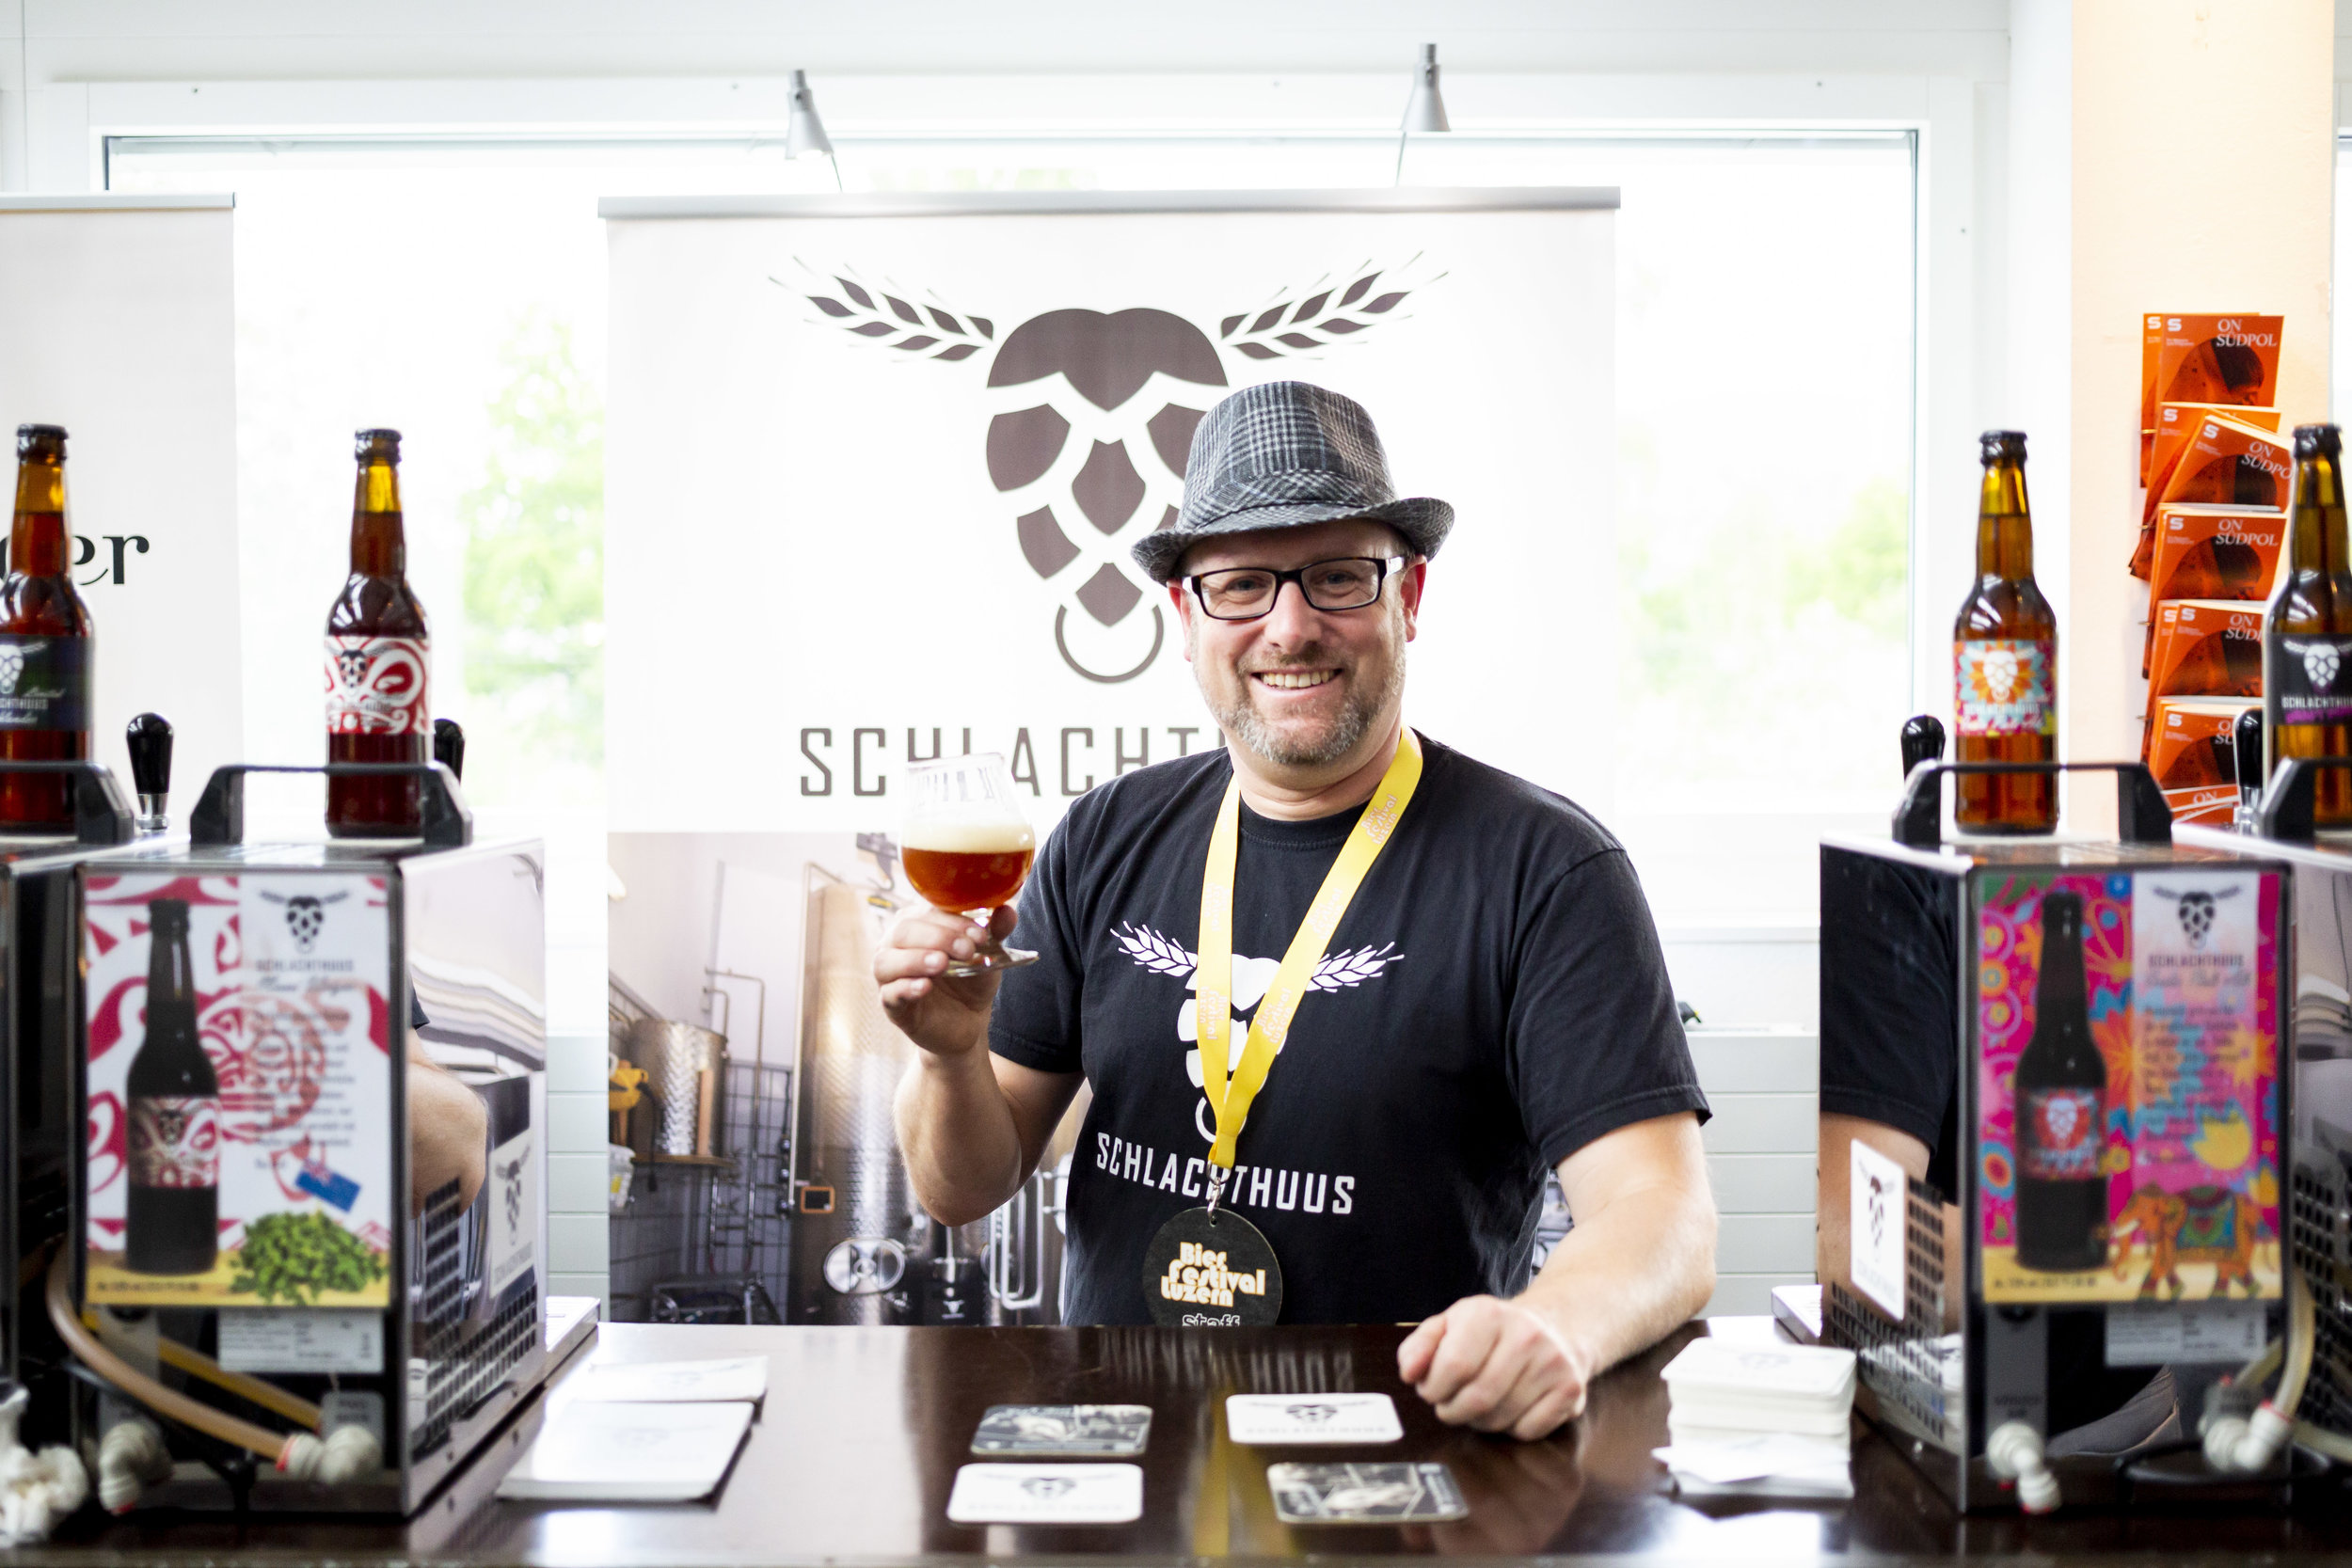 BierfestivalLuzern-41.jpg